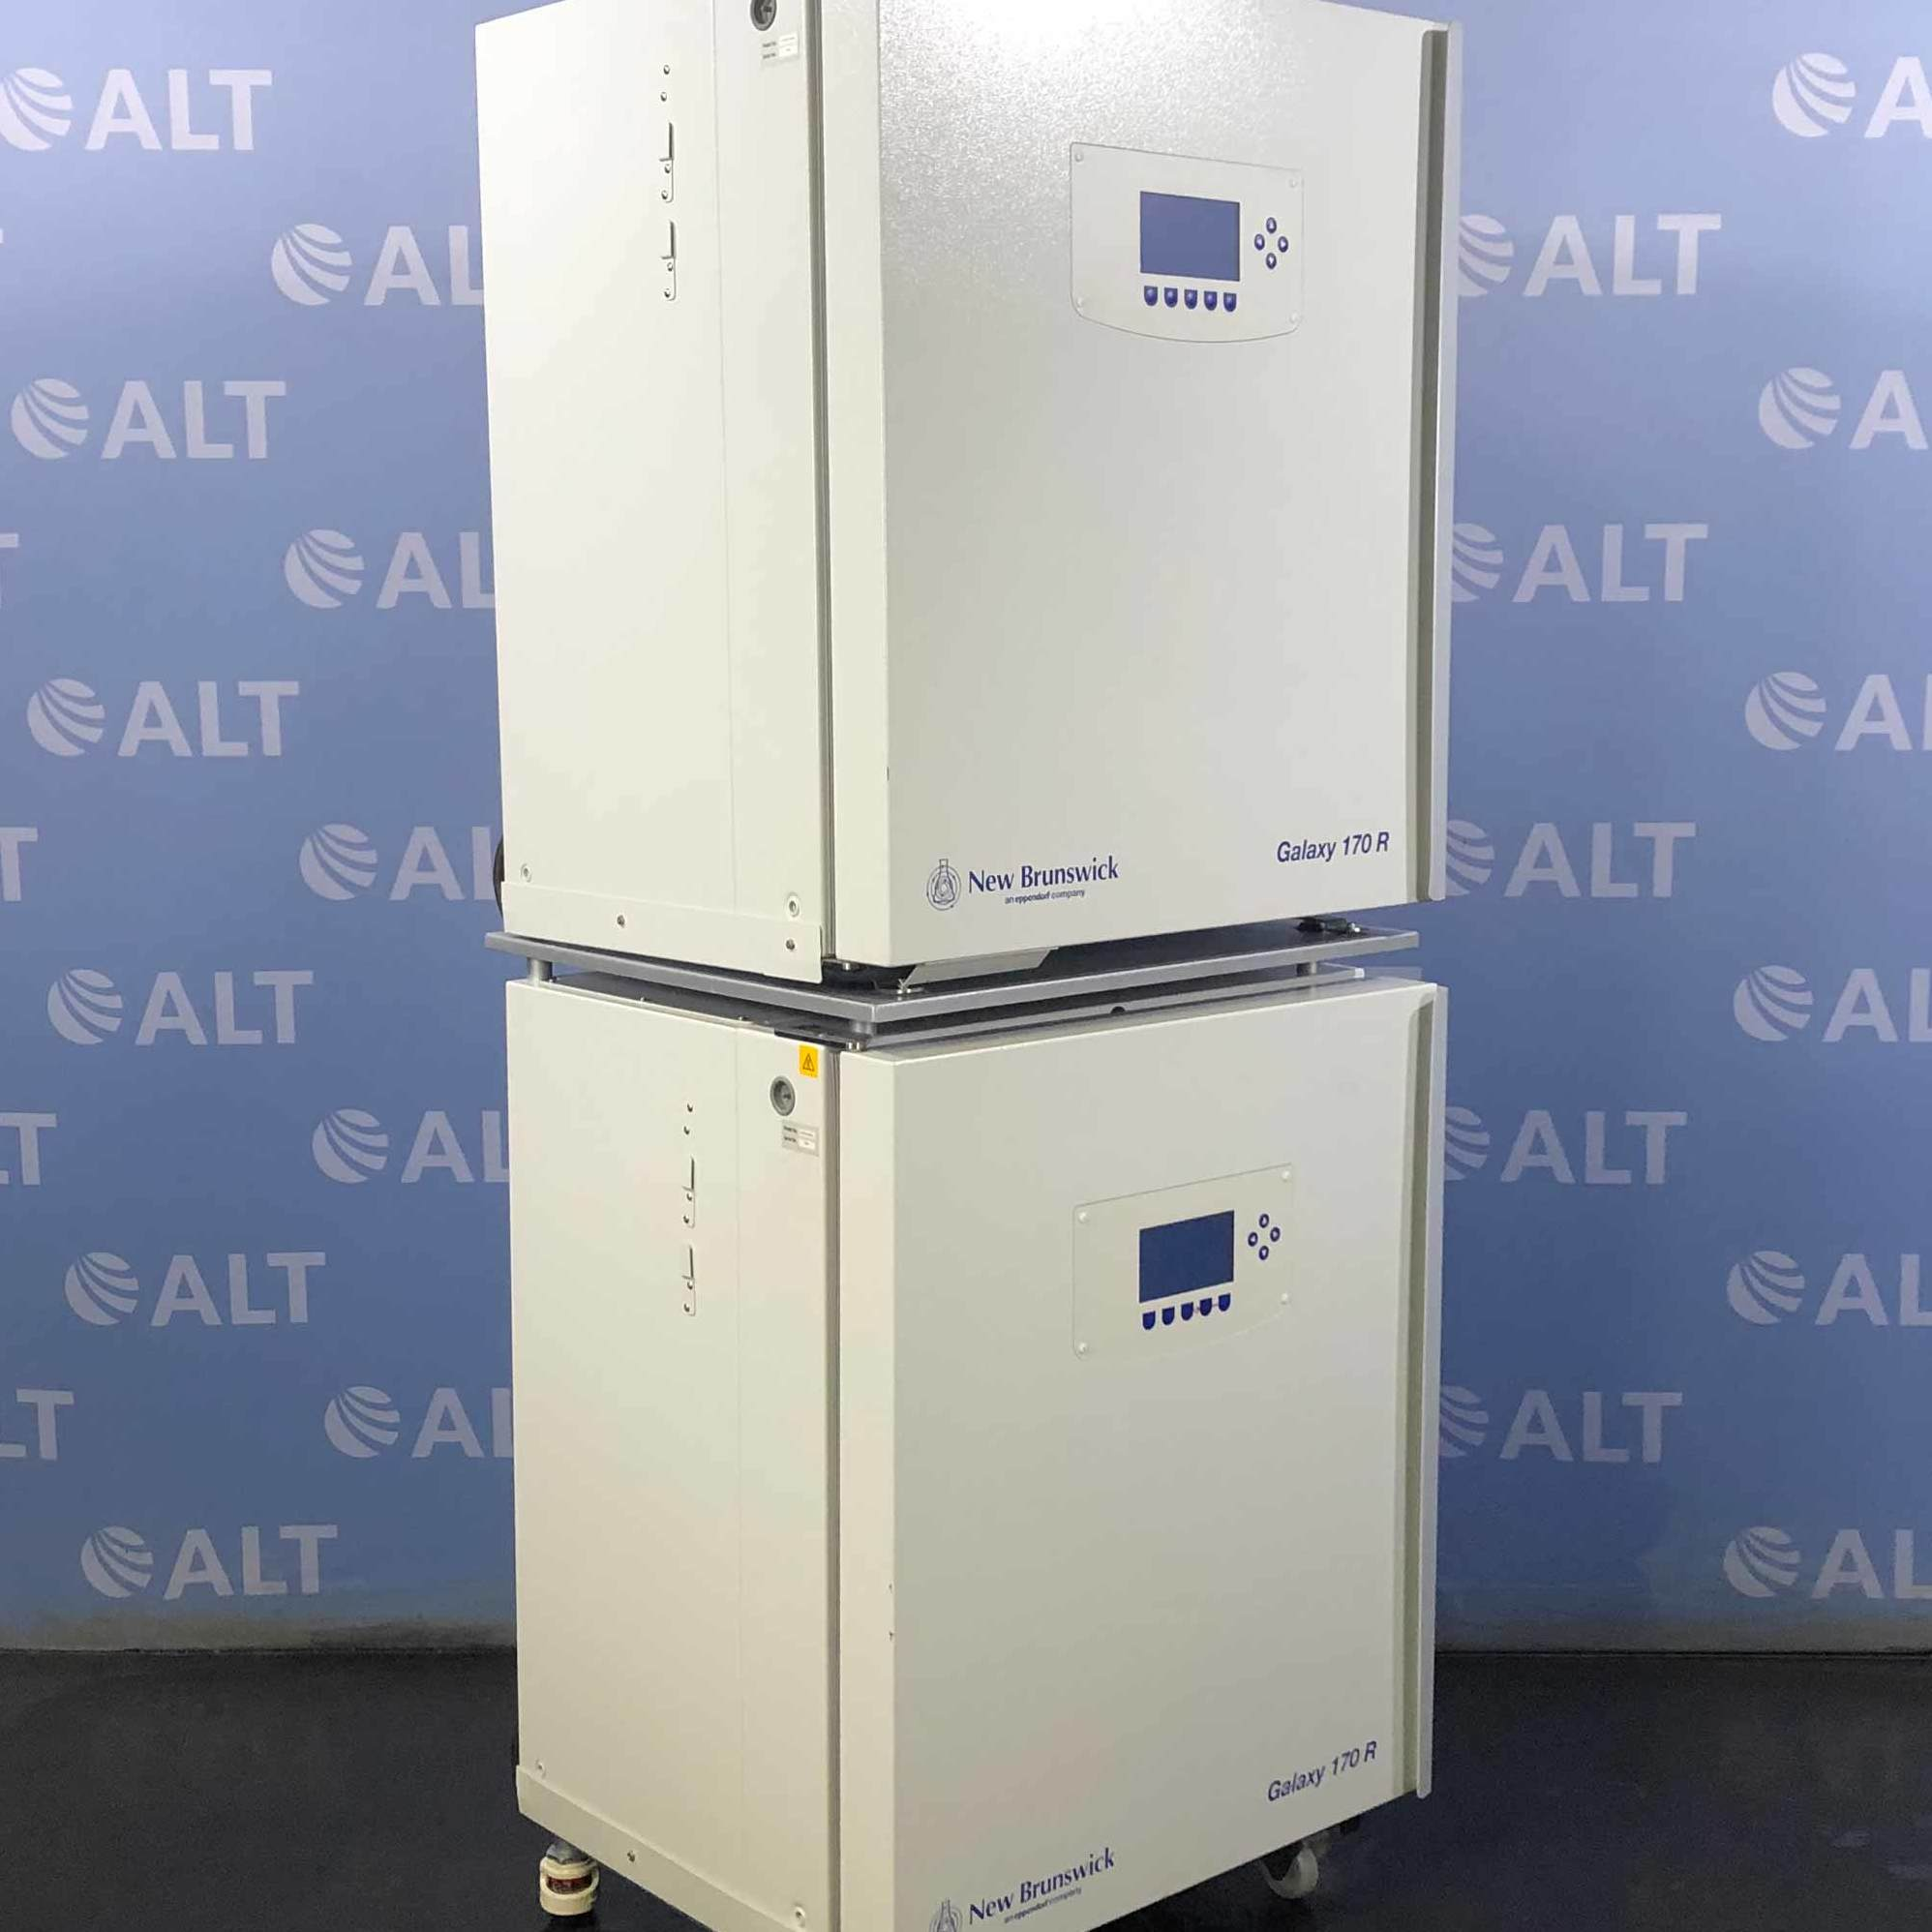 New Brunswick / Eppendorf Galaxy 170 R Dual-Stack  CO2 Incubator Image